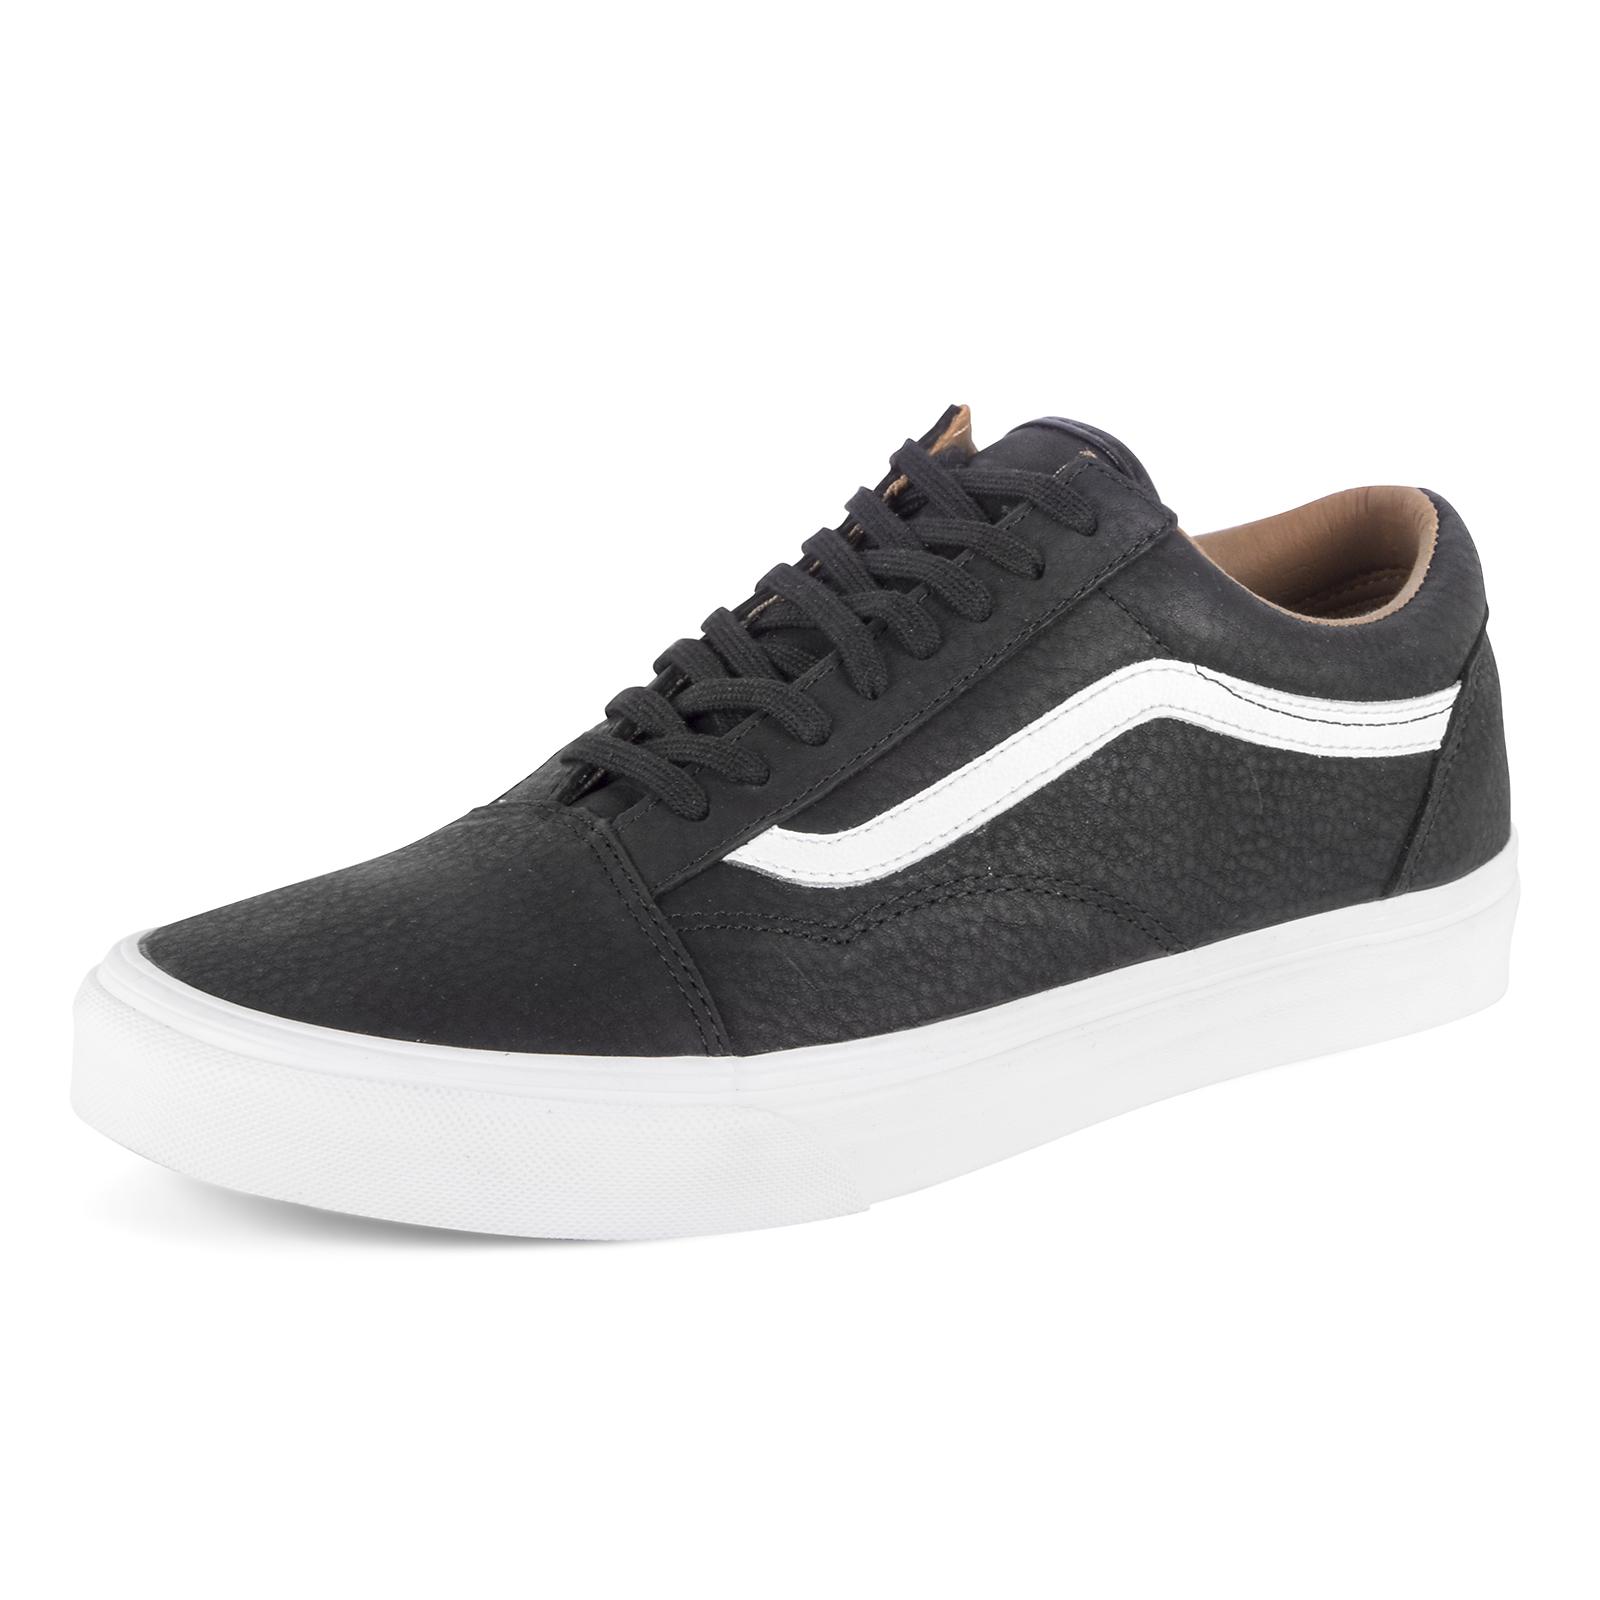 VANS Schuhe UA old skool (premium leather) black / weiß